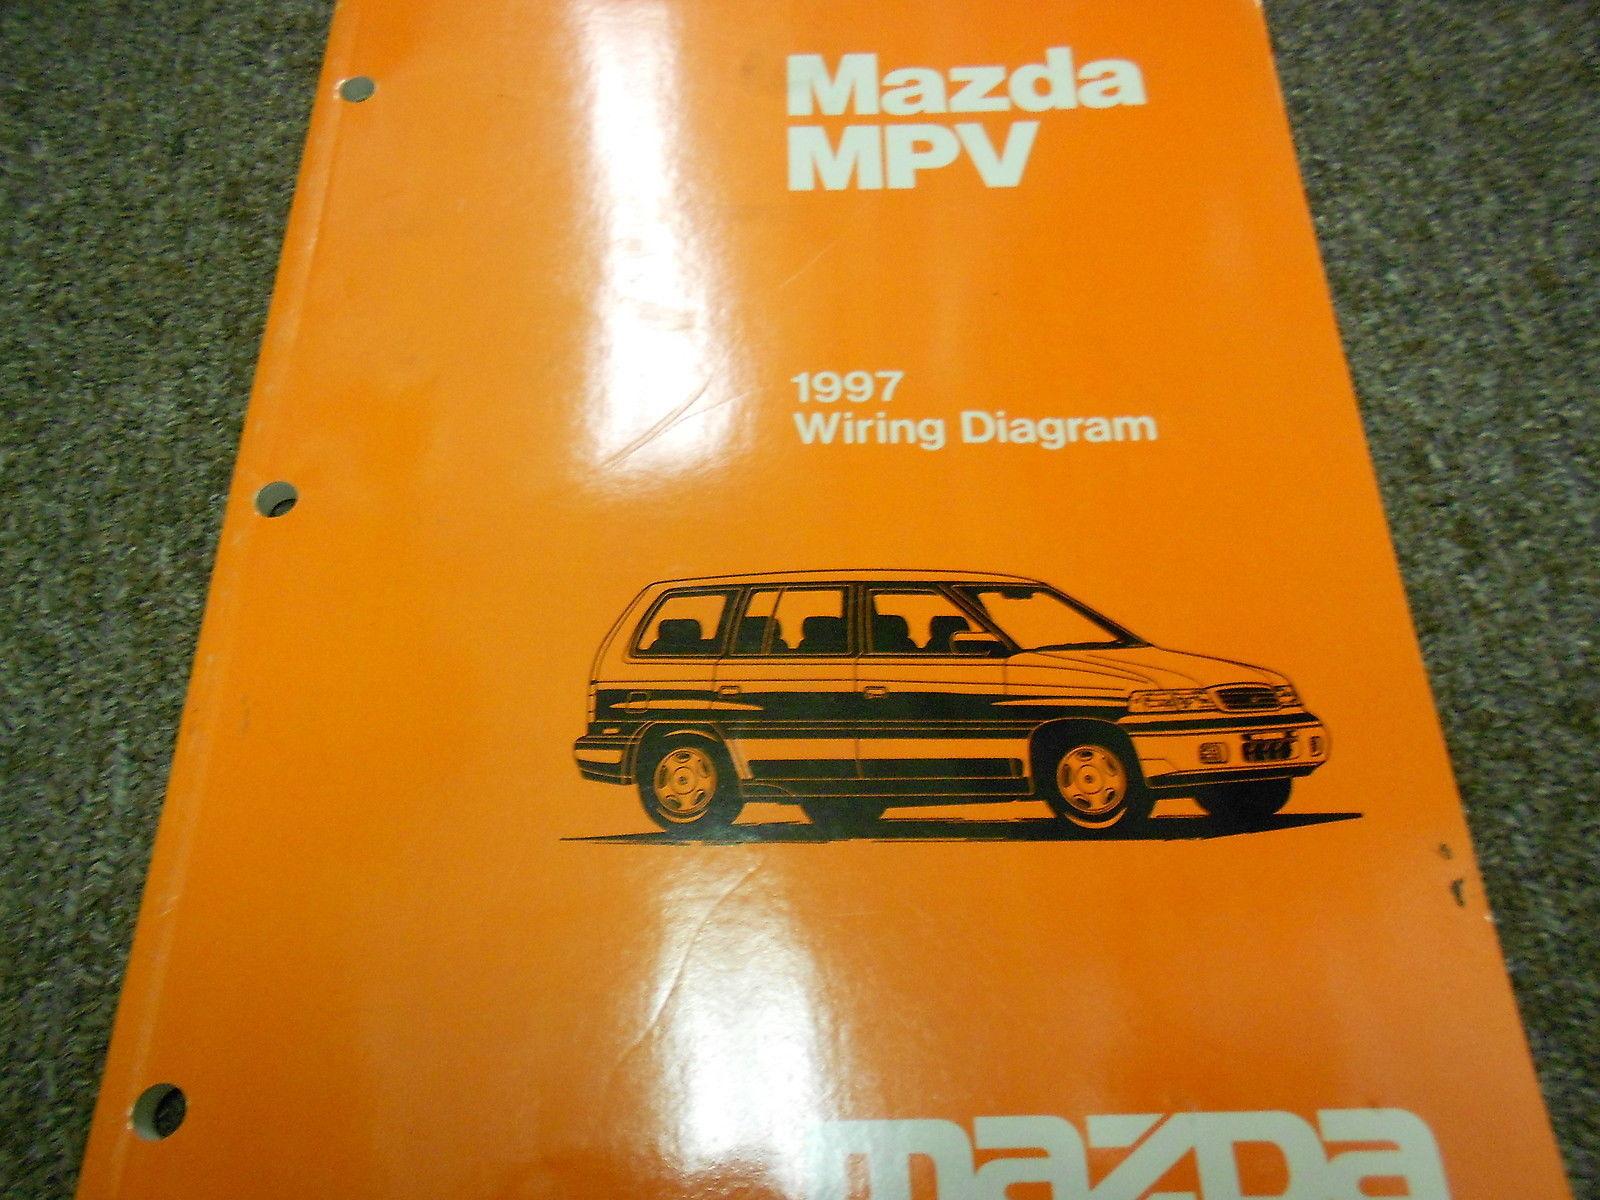 1997 Mazda Mpv Van Electrical Wiring Diagram And 50 Similar Items